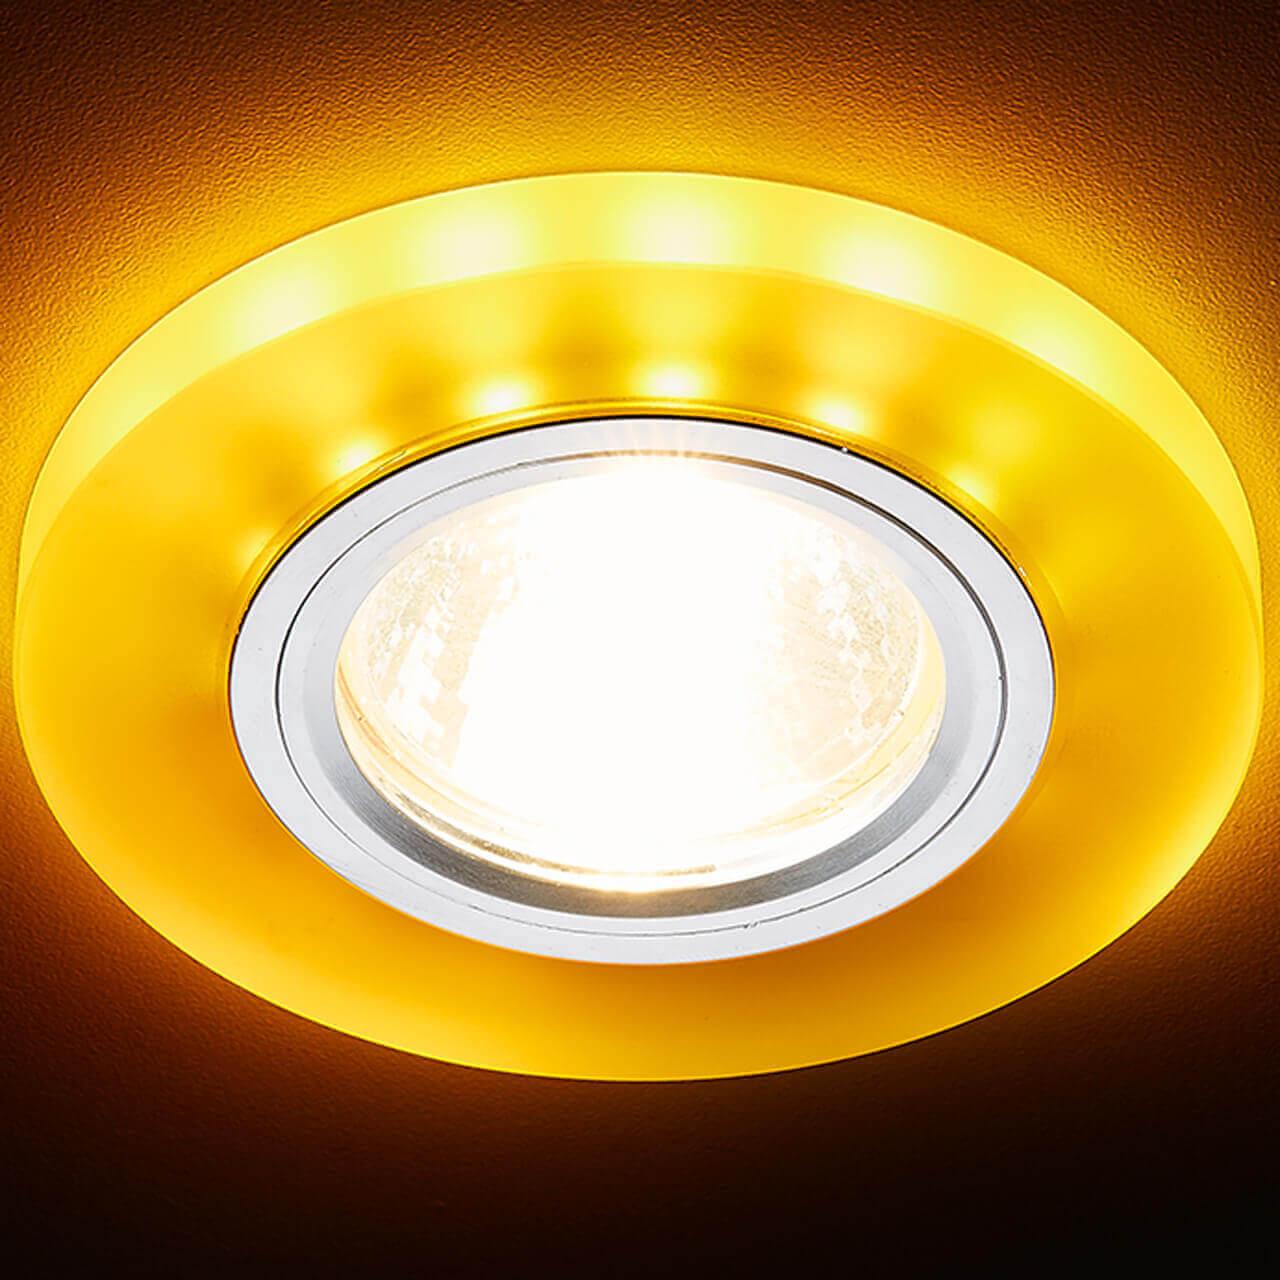 светильник ambrella light s214 wh ch wh led Светильник Ambrella light S214 WH/CH/YL Led